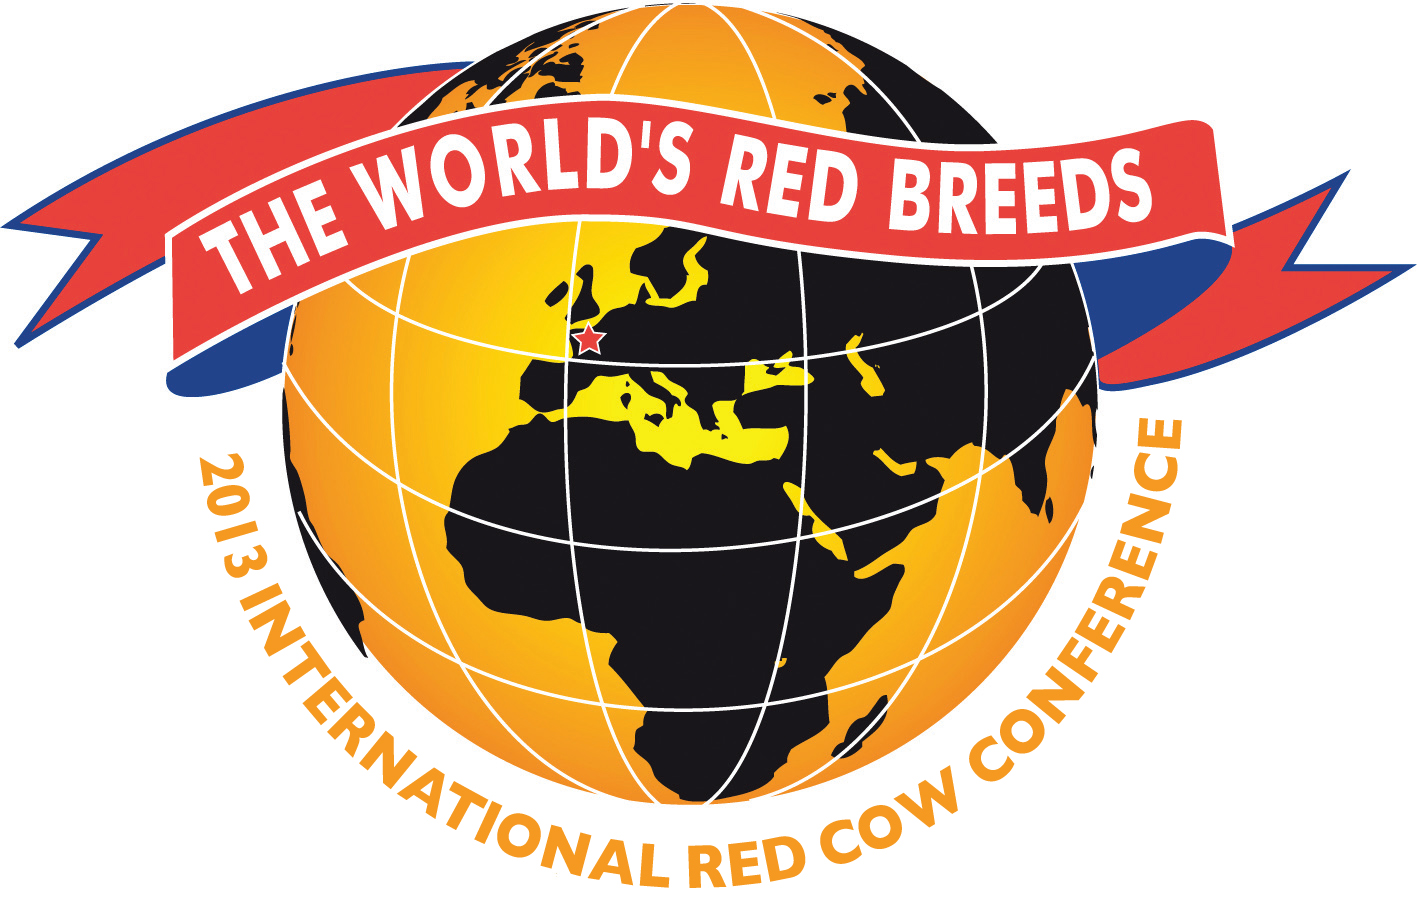 International Red Dairy Breed Federation (IRDBF)